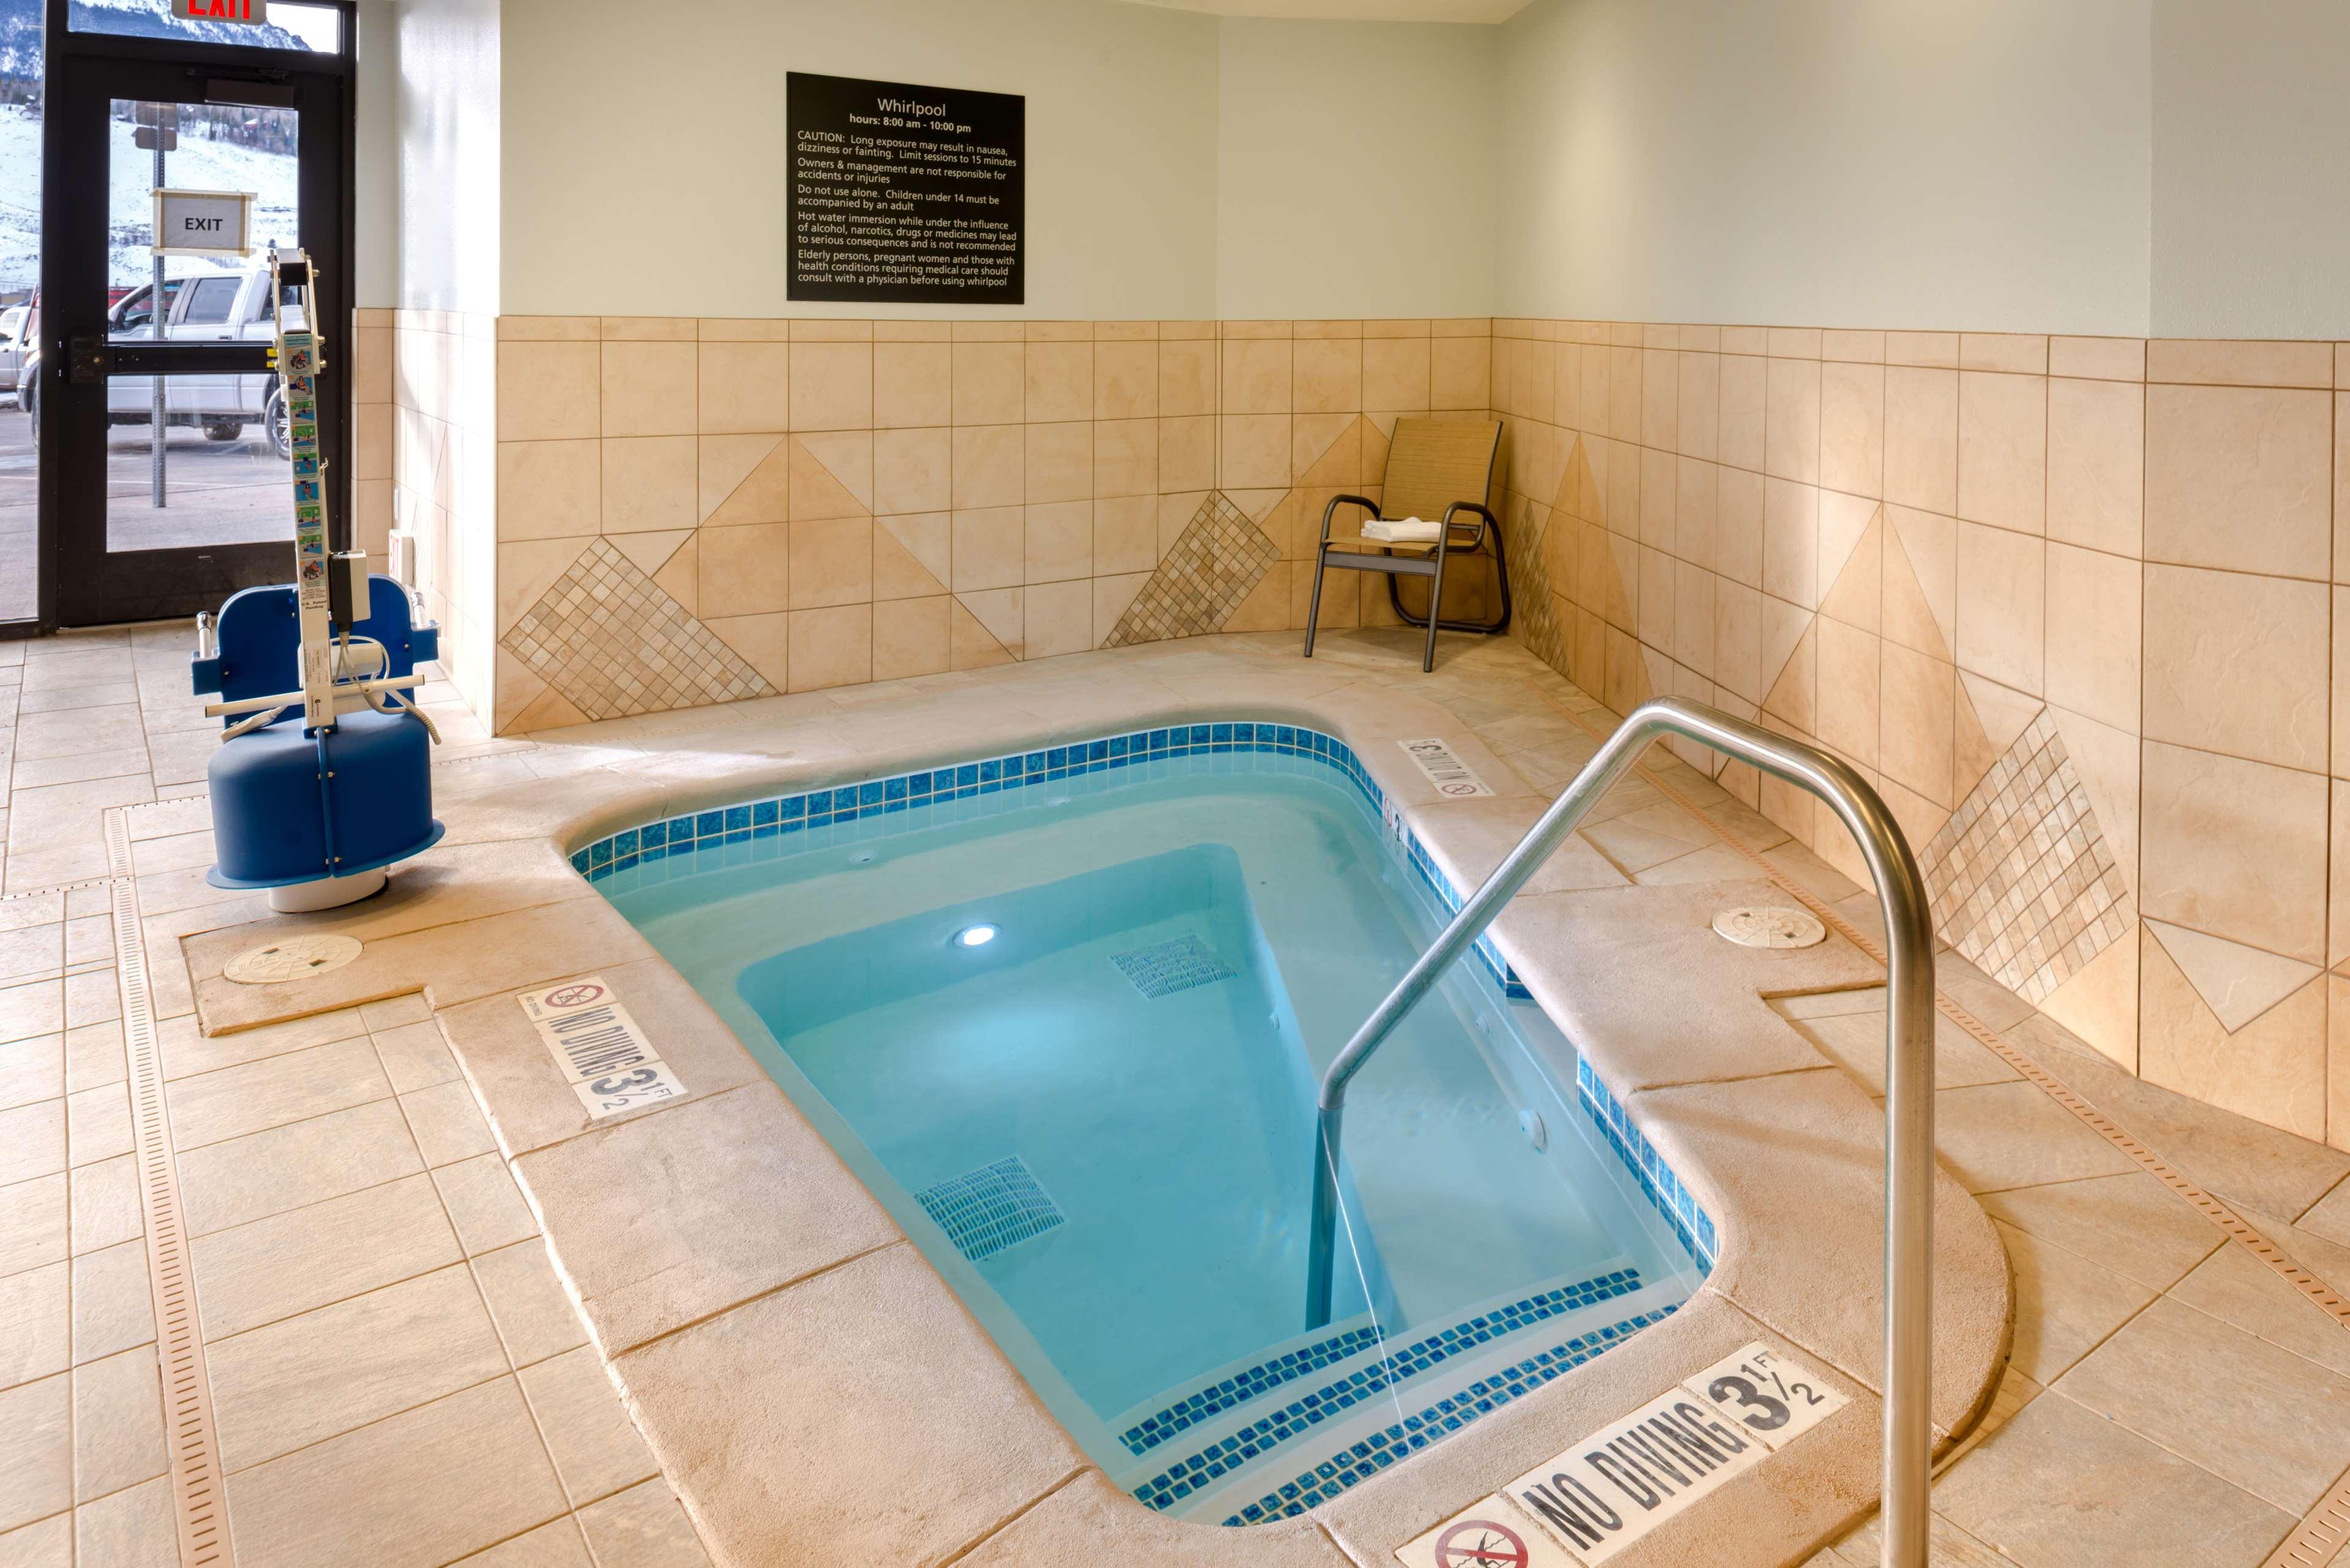 Hampton Inn & Suites Silverthorne image 7